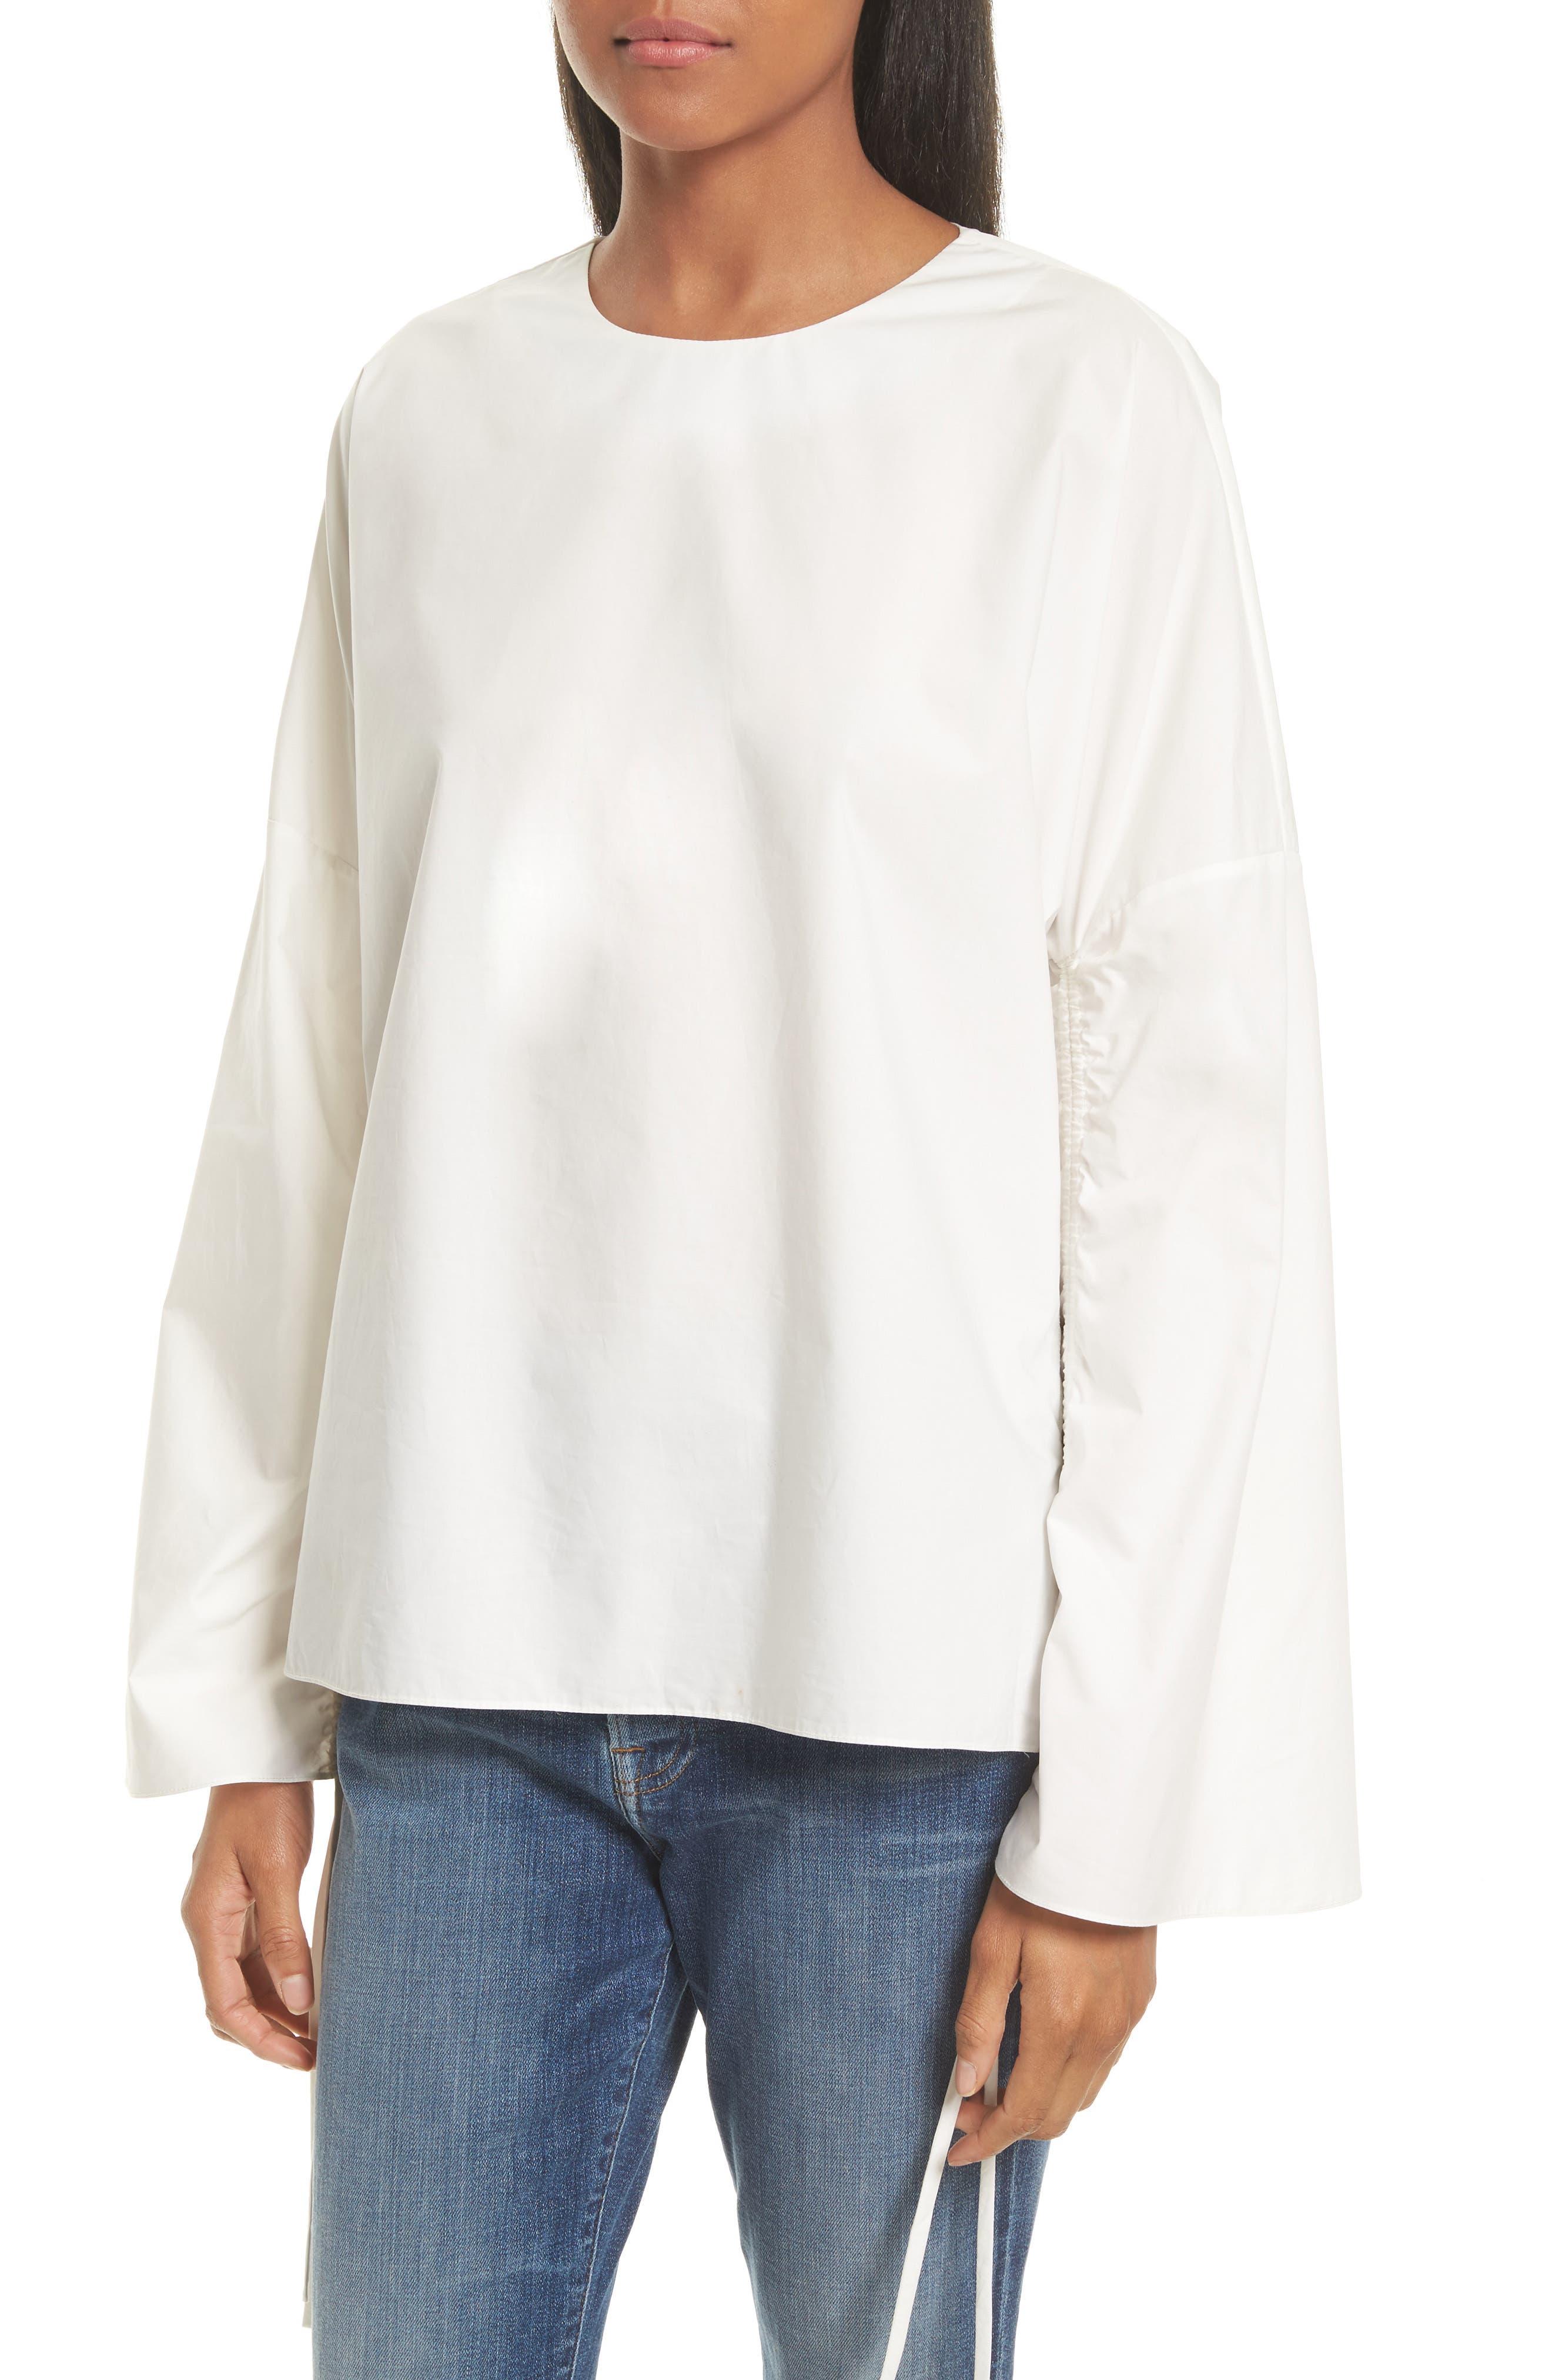 TIBI,                             Bell Sleeve Cotton Poplin Top,                             Alternate thumbnail 4, color,                             104